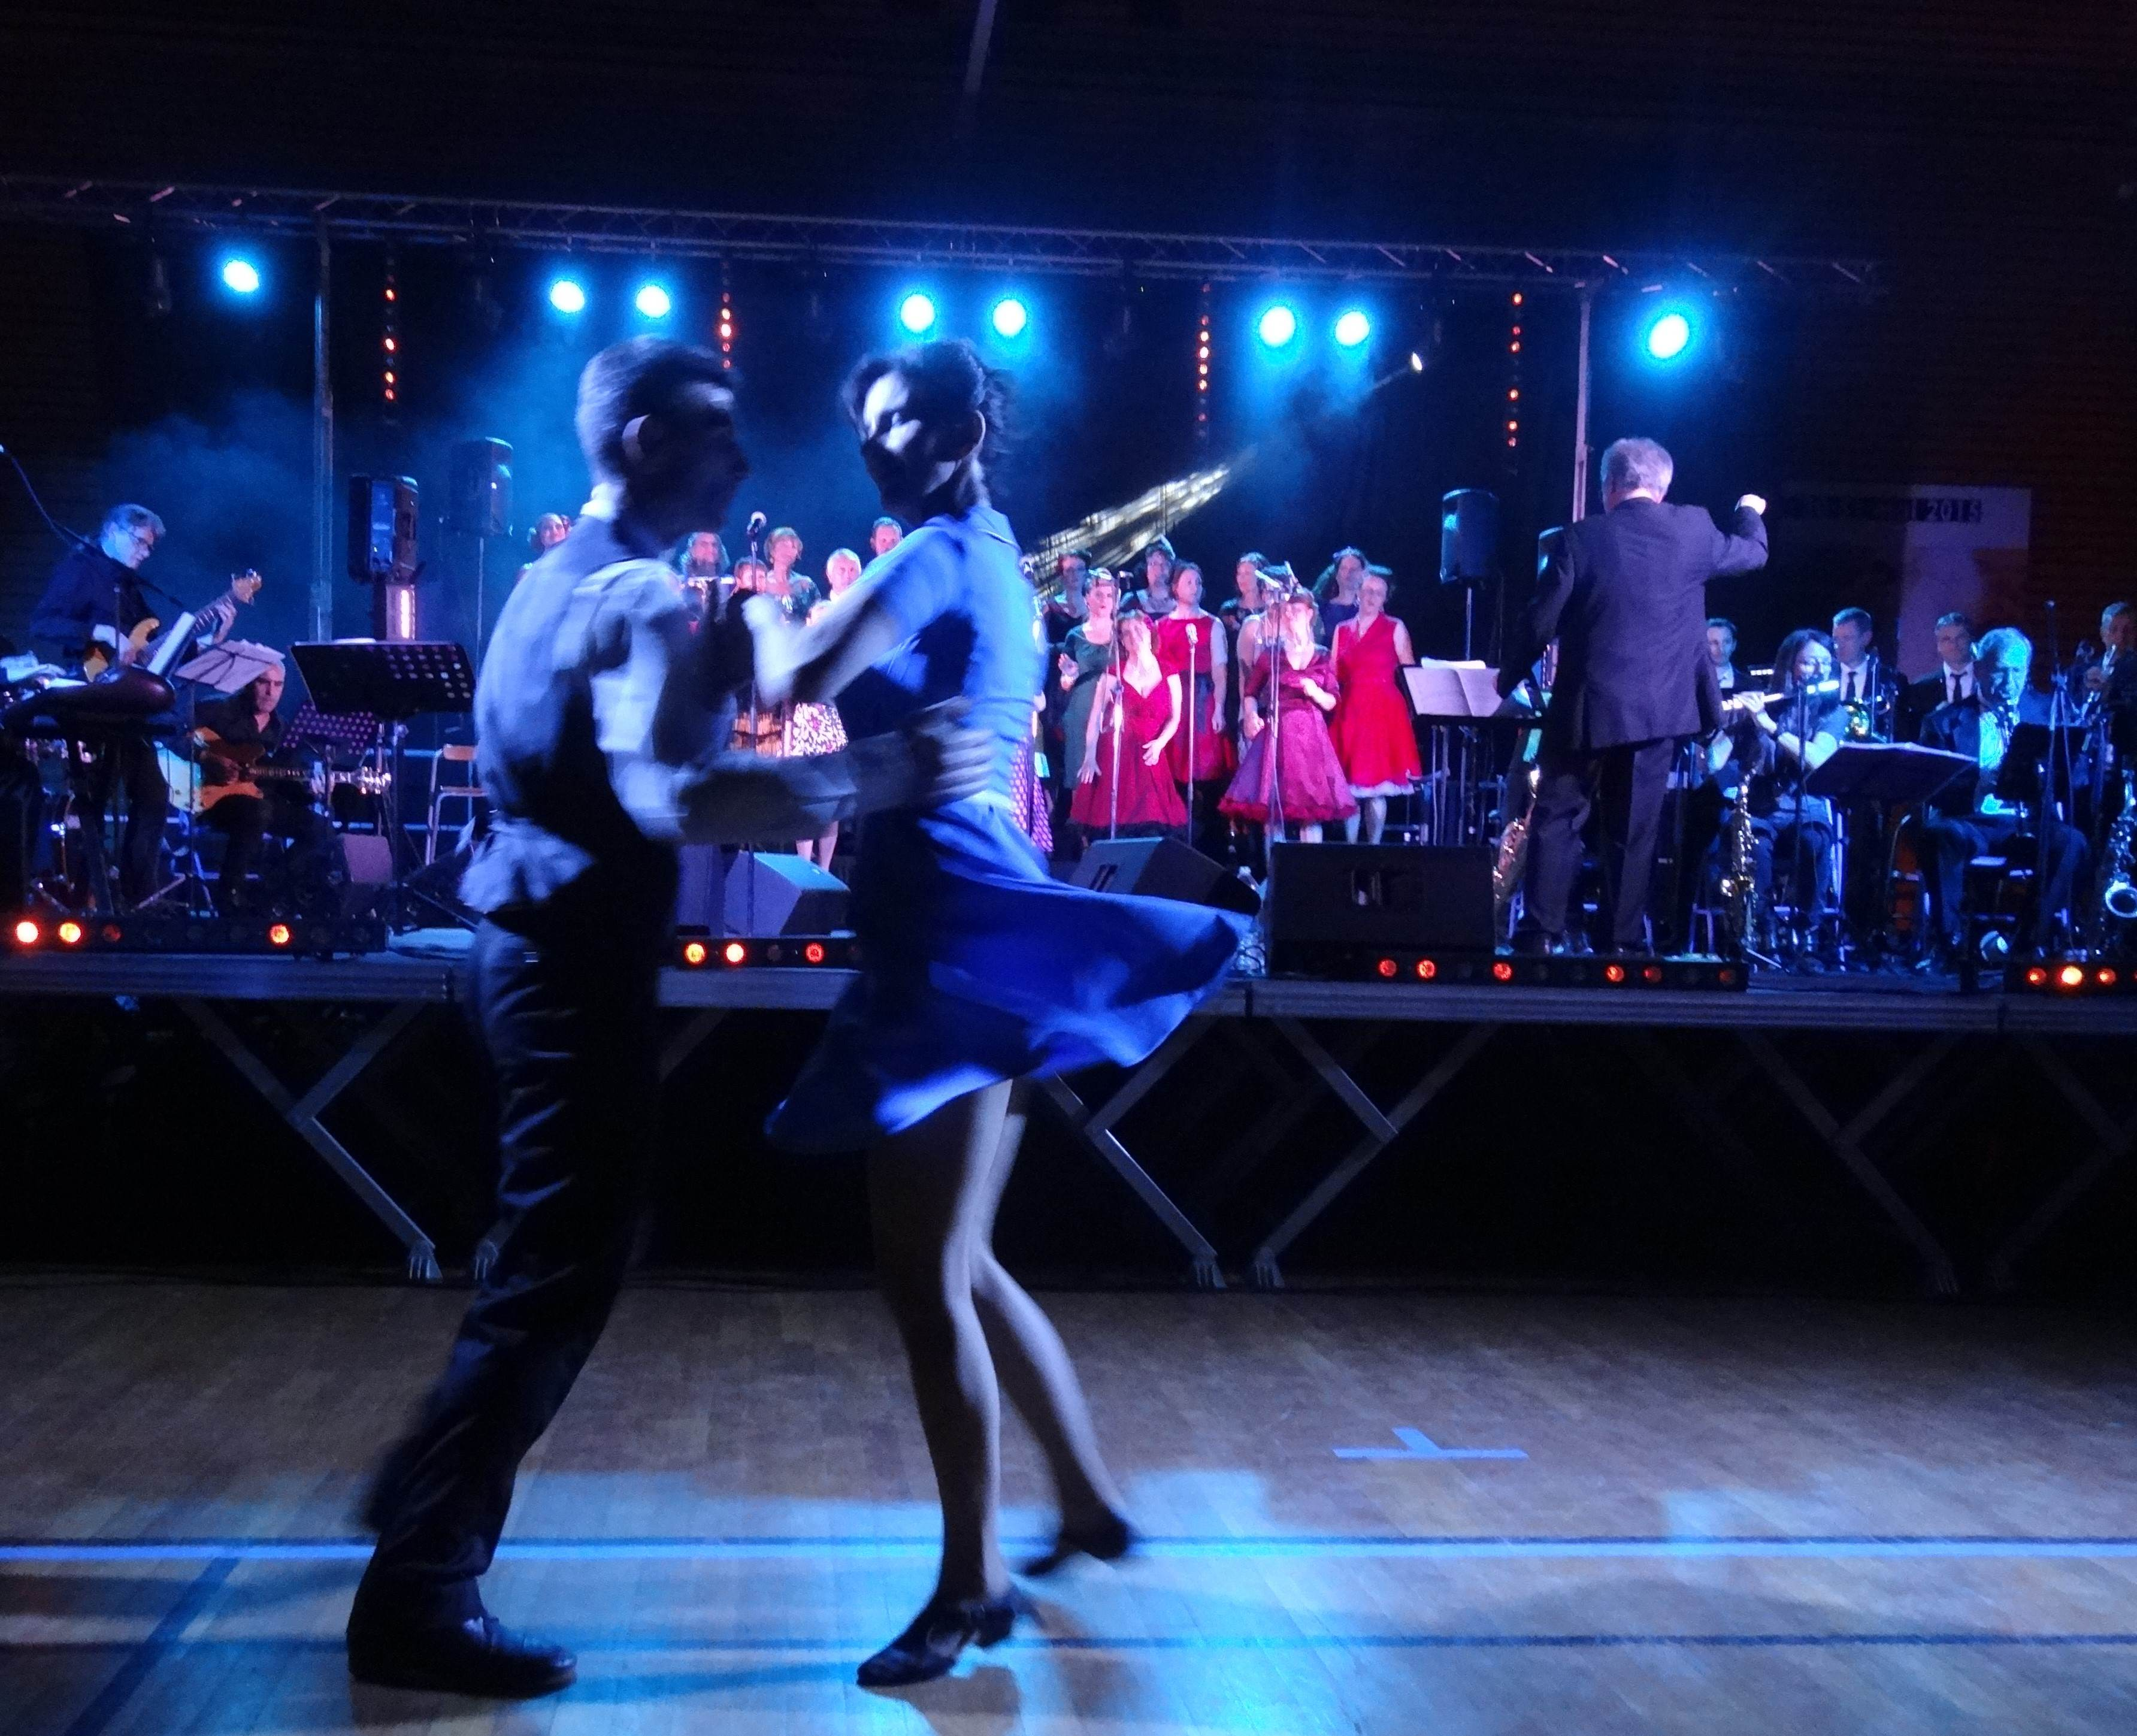 DSC09203 - let's swing - danse - balboa - lindy - concert - sinatra - WEB